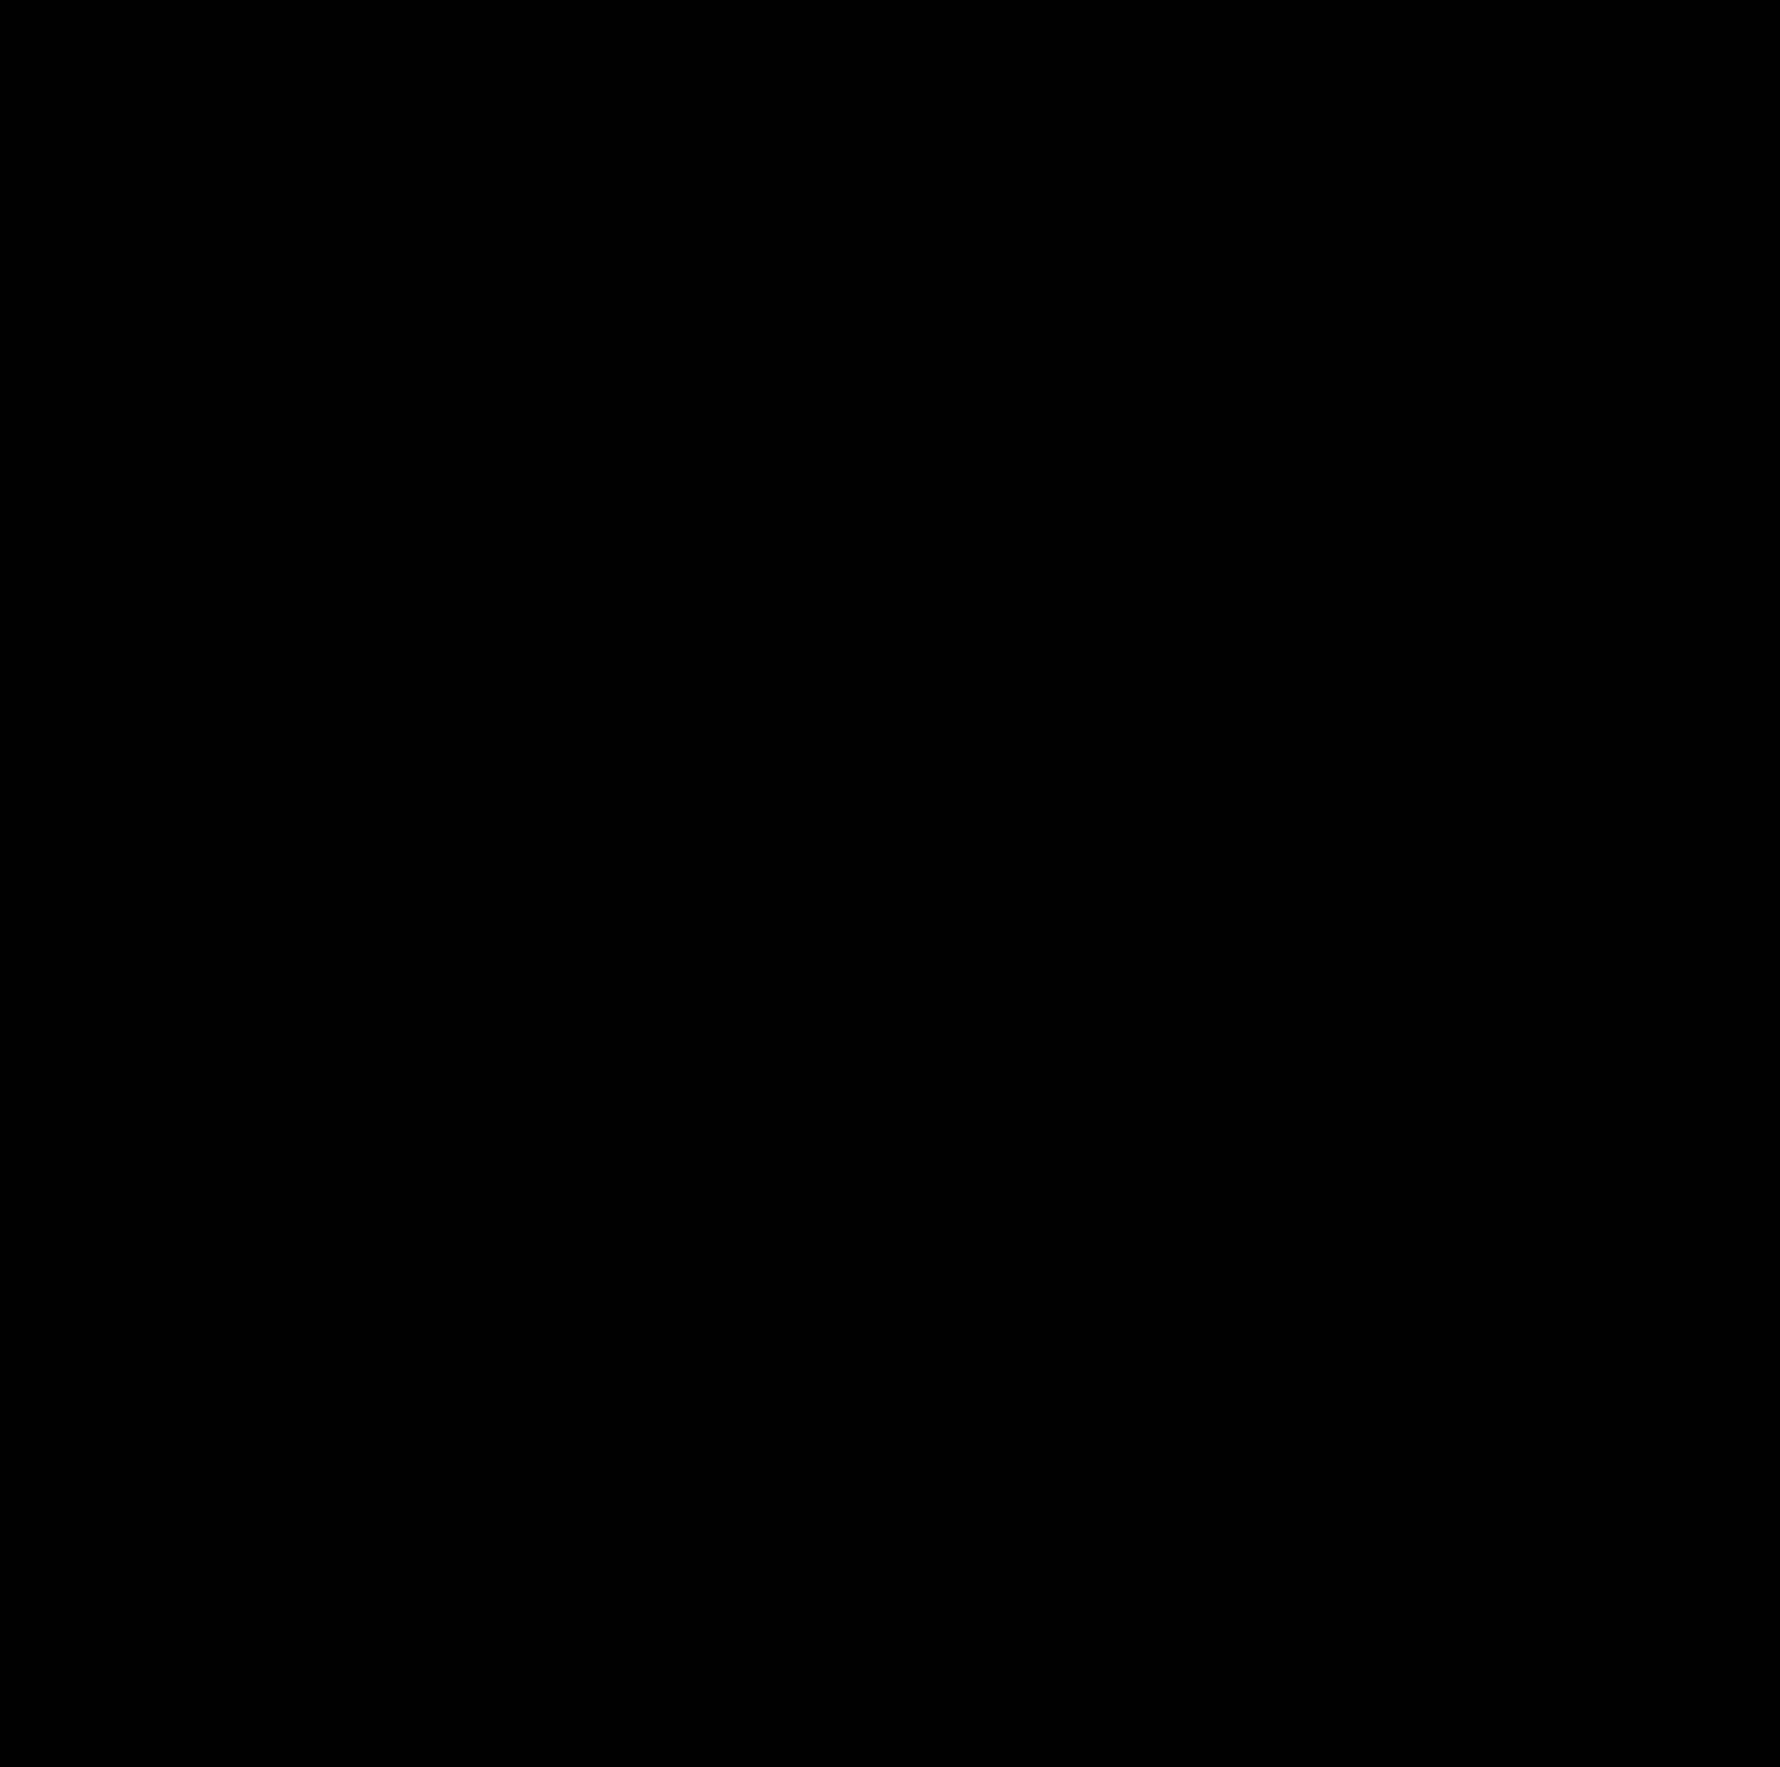 Chubby Diaries logo.